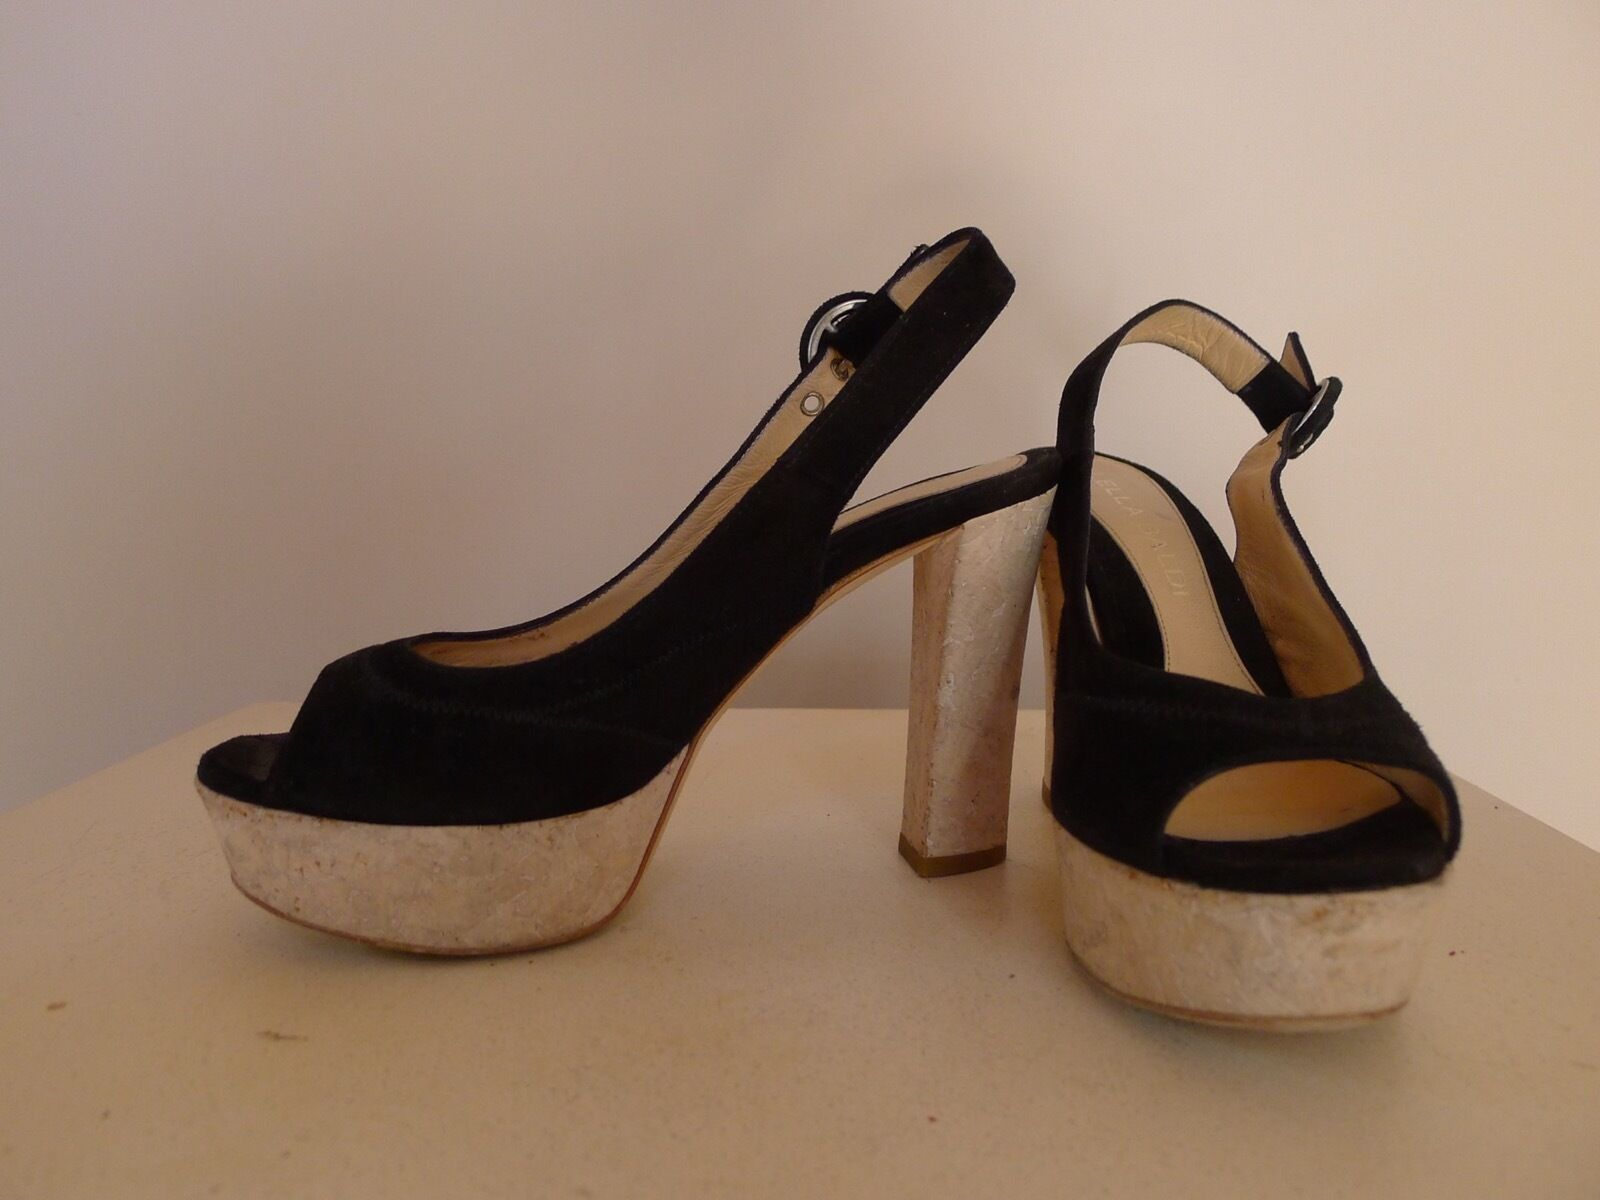 Lella Baldi 36 schwarz suede Leder high high high heels schuhe platform peep-toe very good 28d893